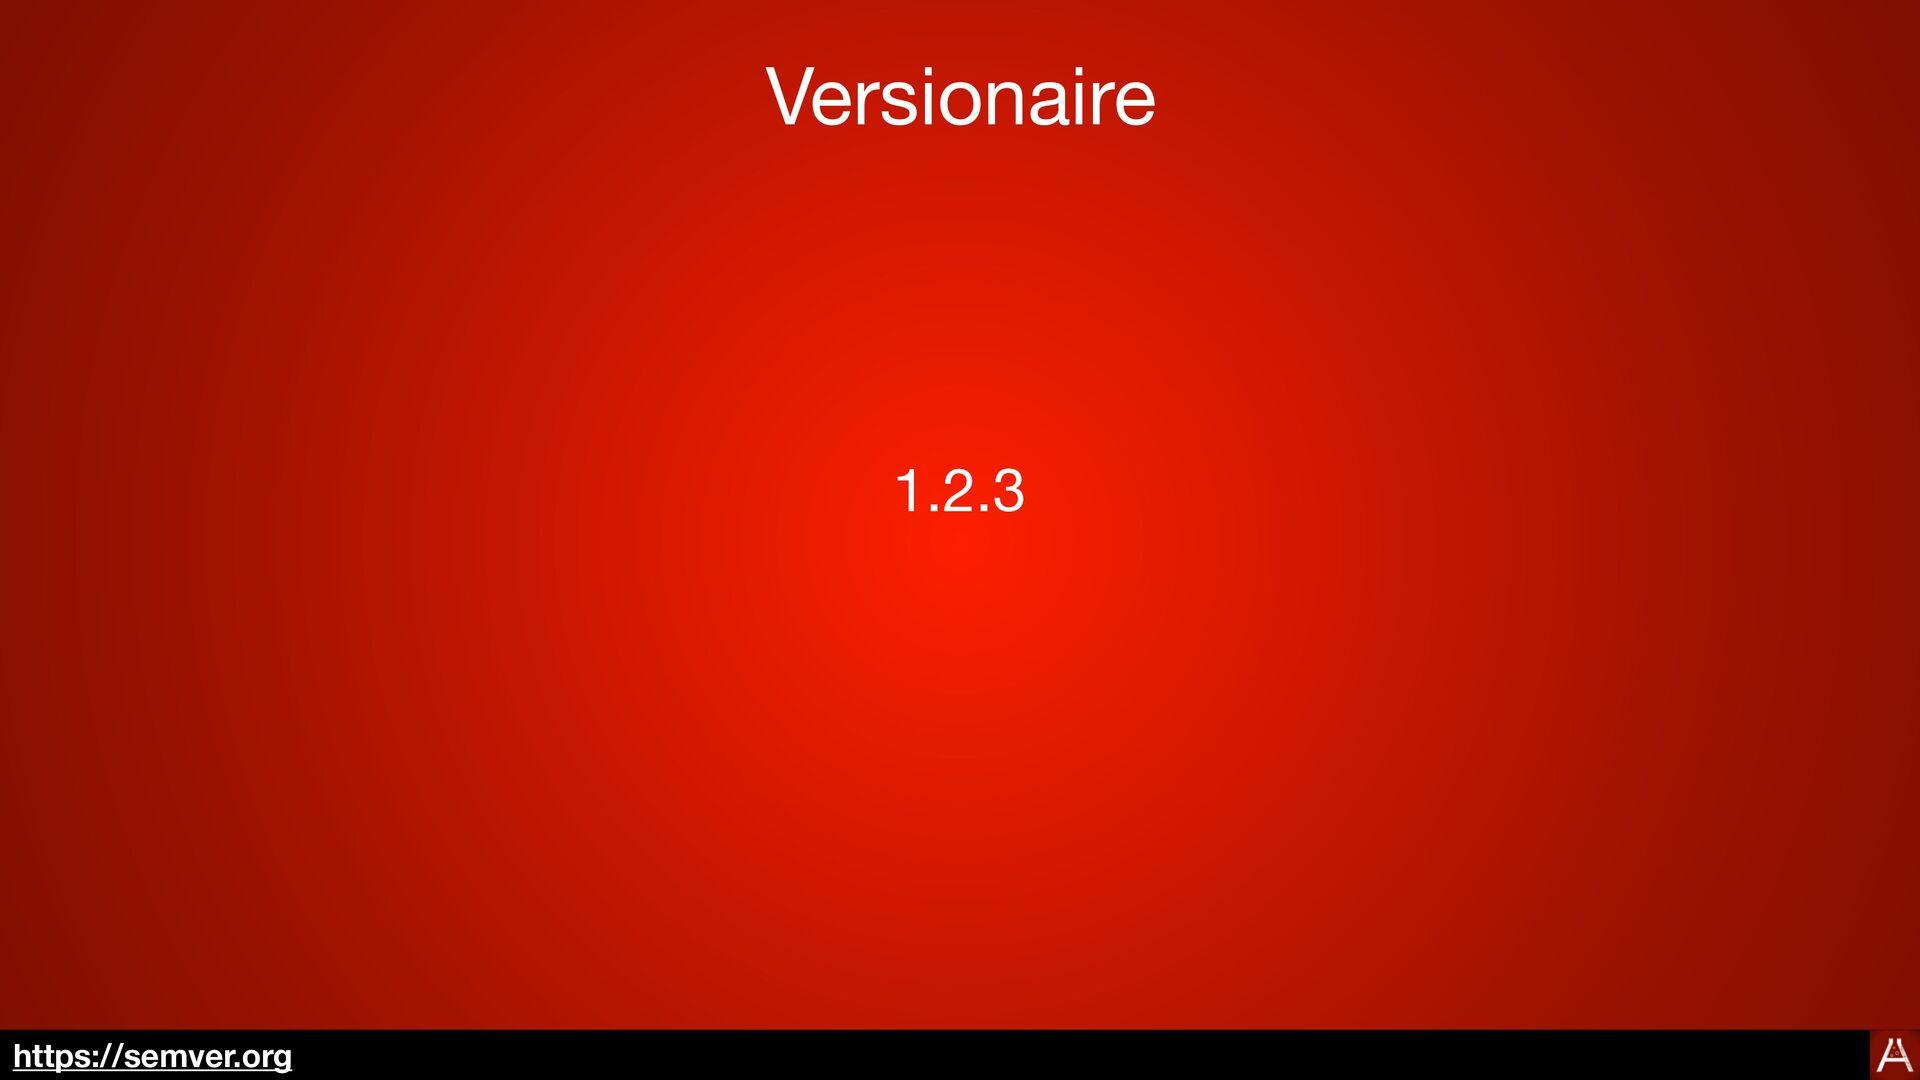 Hash Array String Versionaire https://www.alche...